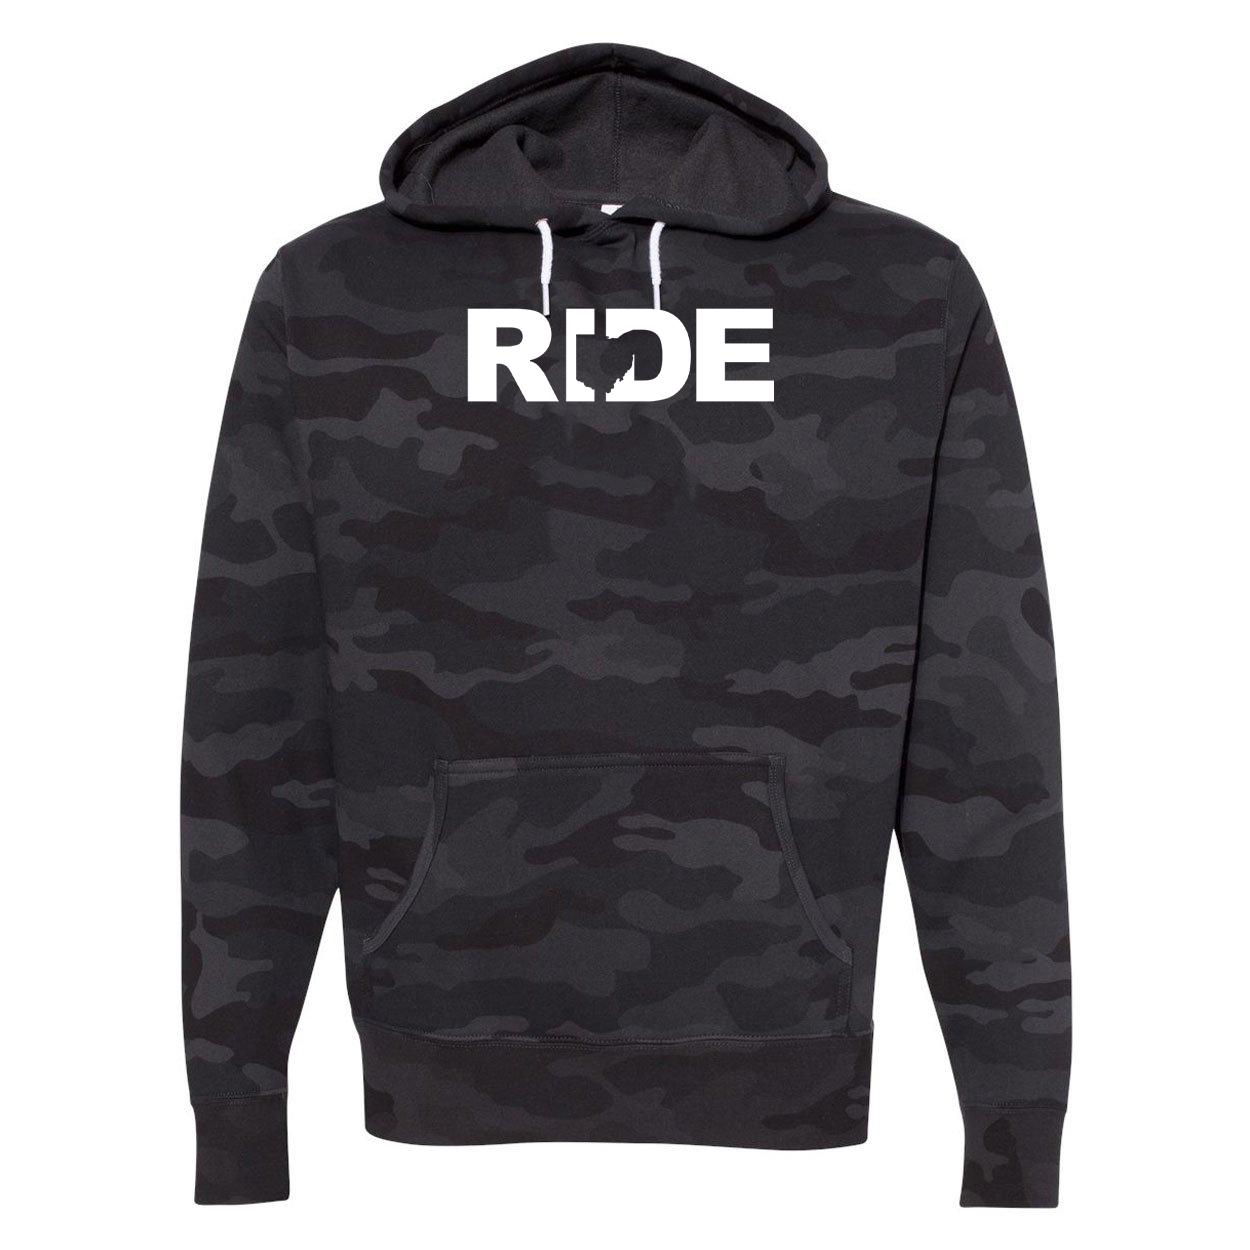 Ride Ohio Classic Unisex Hooded Sweatshirt Black Camo (White Logo)